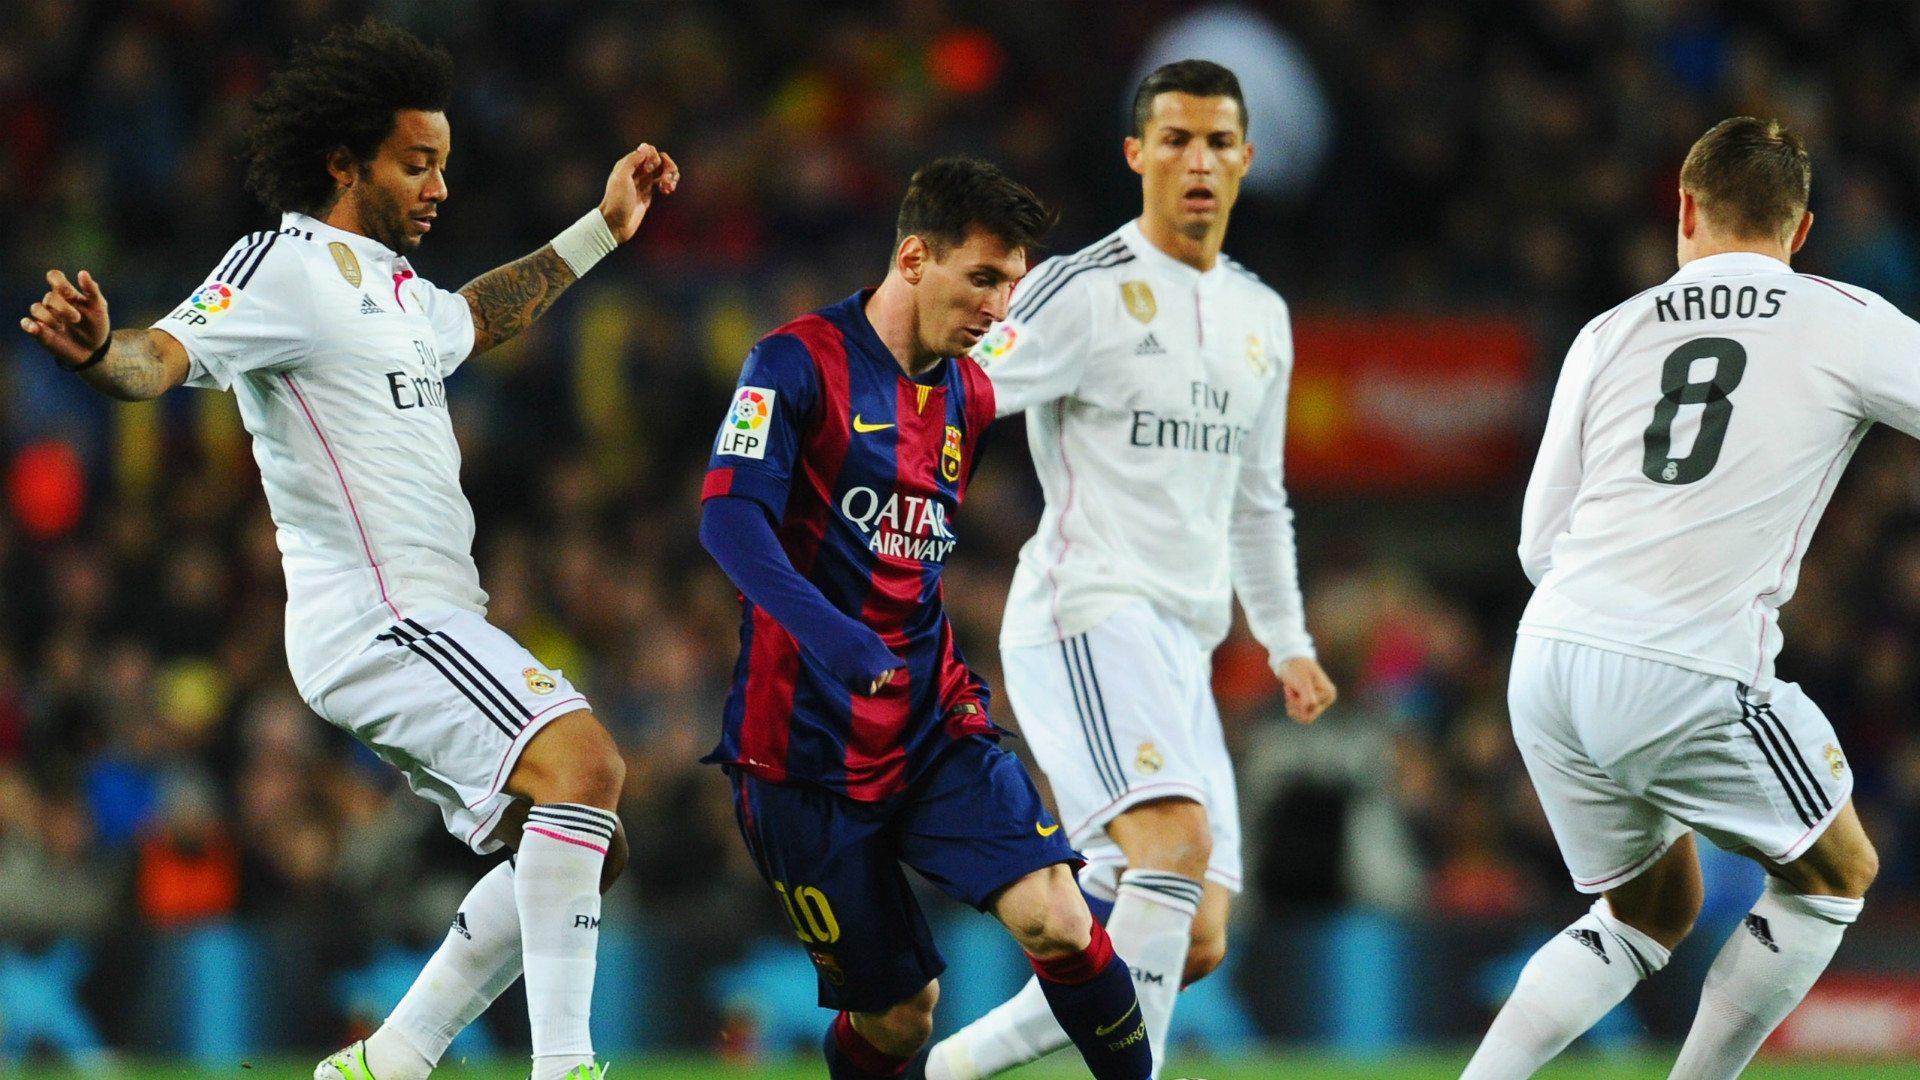 Fútbol Club Barcelona - R.C.D. Mallorca. Pronóstico y ...